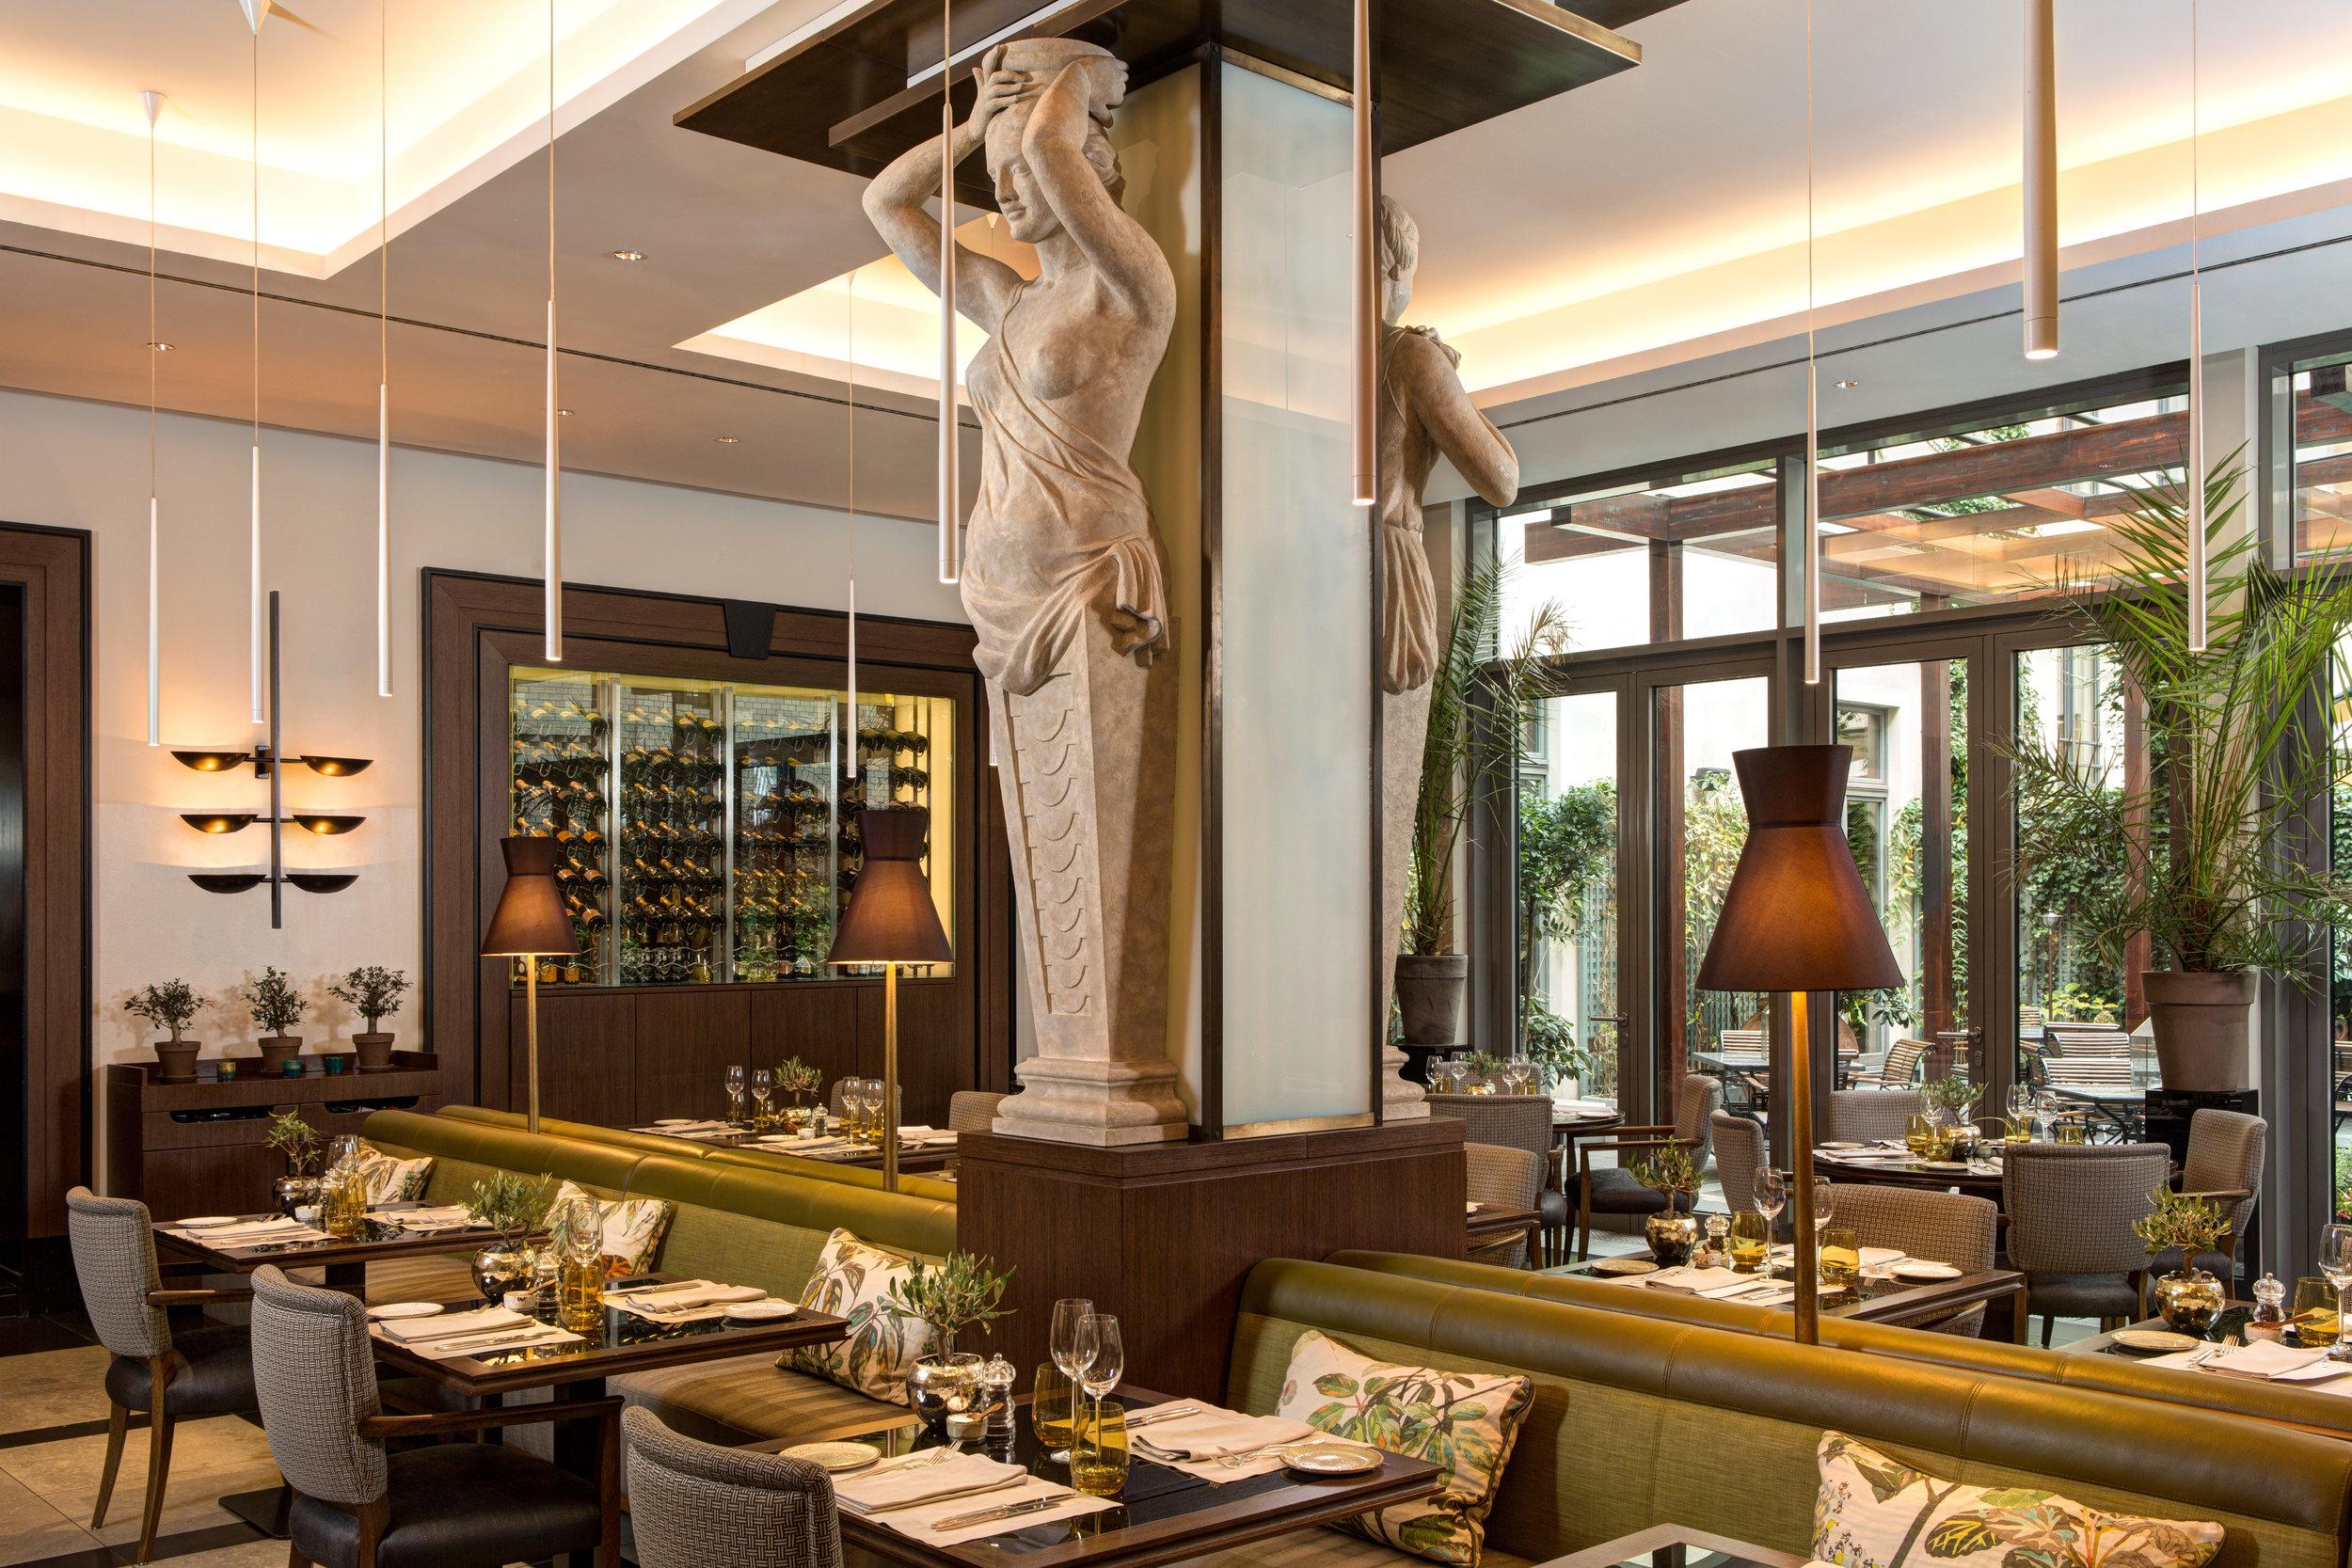 6 RFH Hotel de Rome - La Banca restaurant.jpg